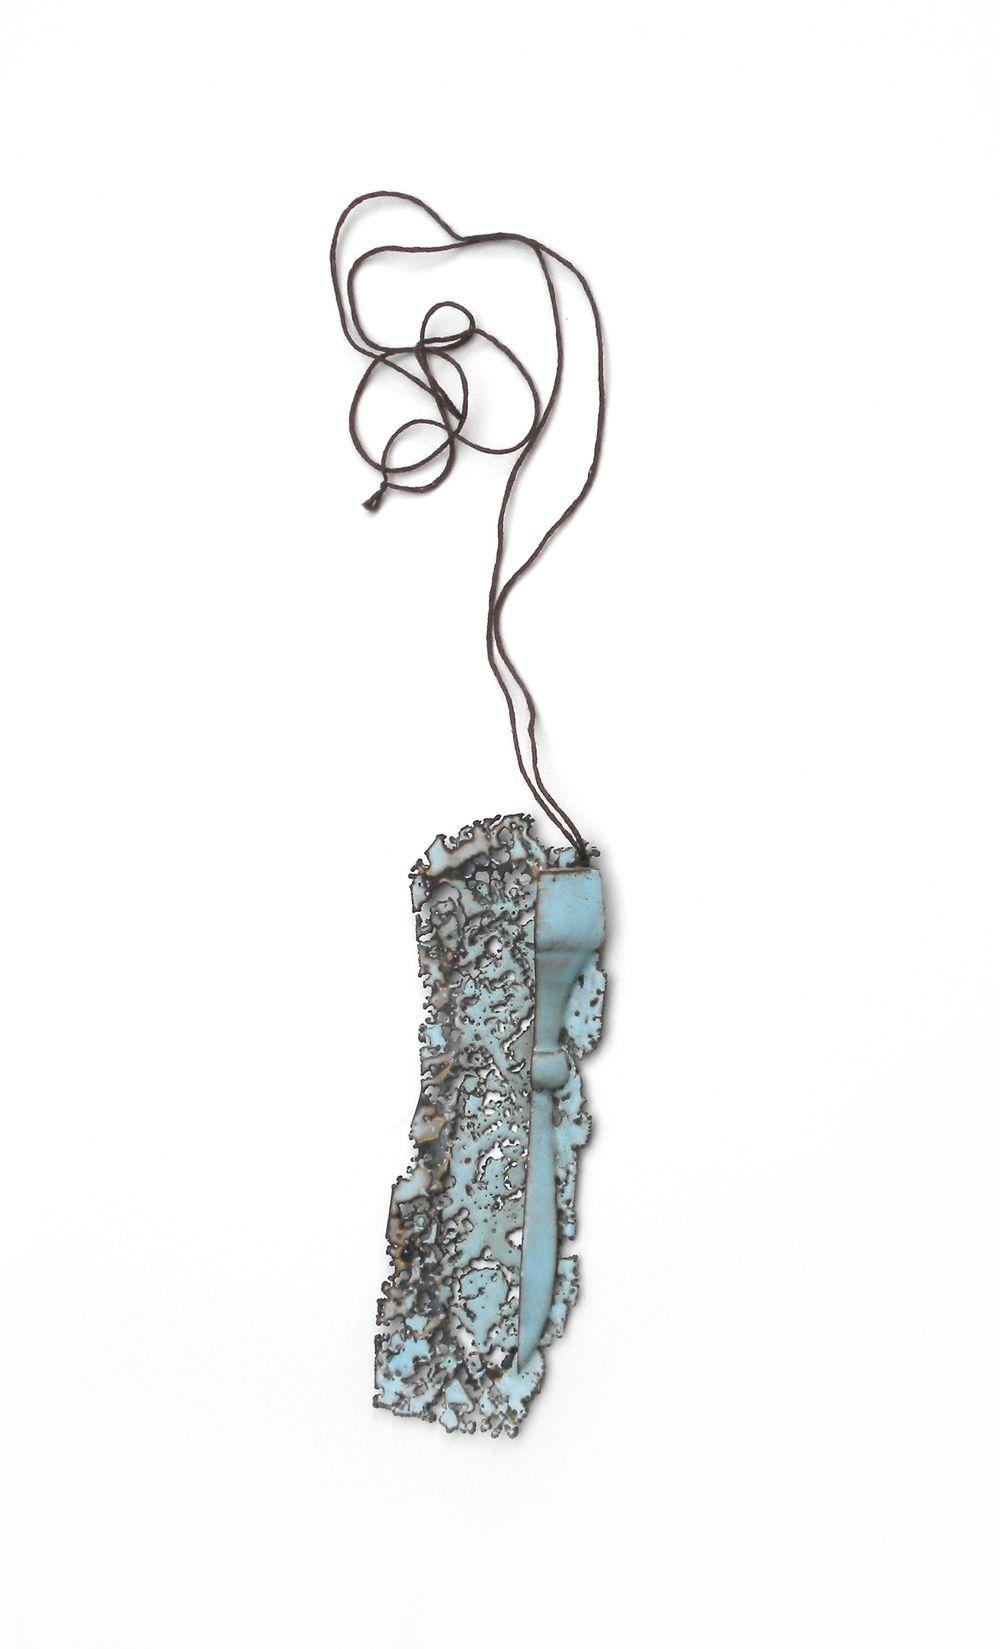 copper, enamel, thread  2013 amanda packer